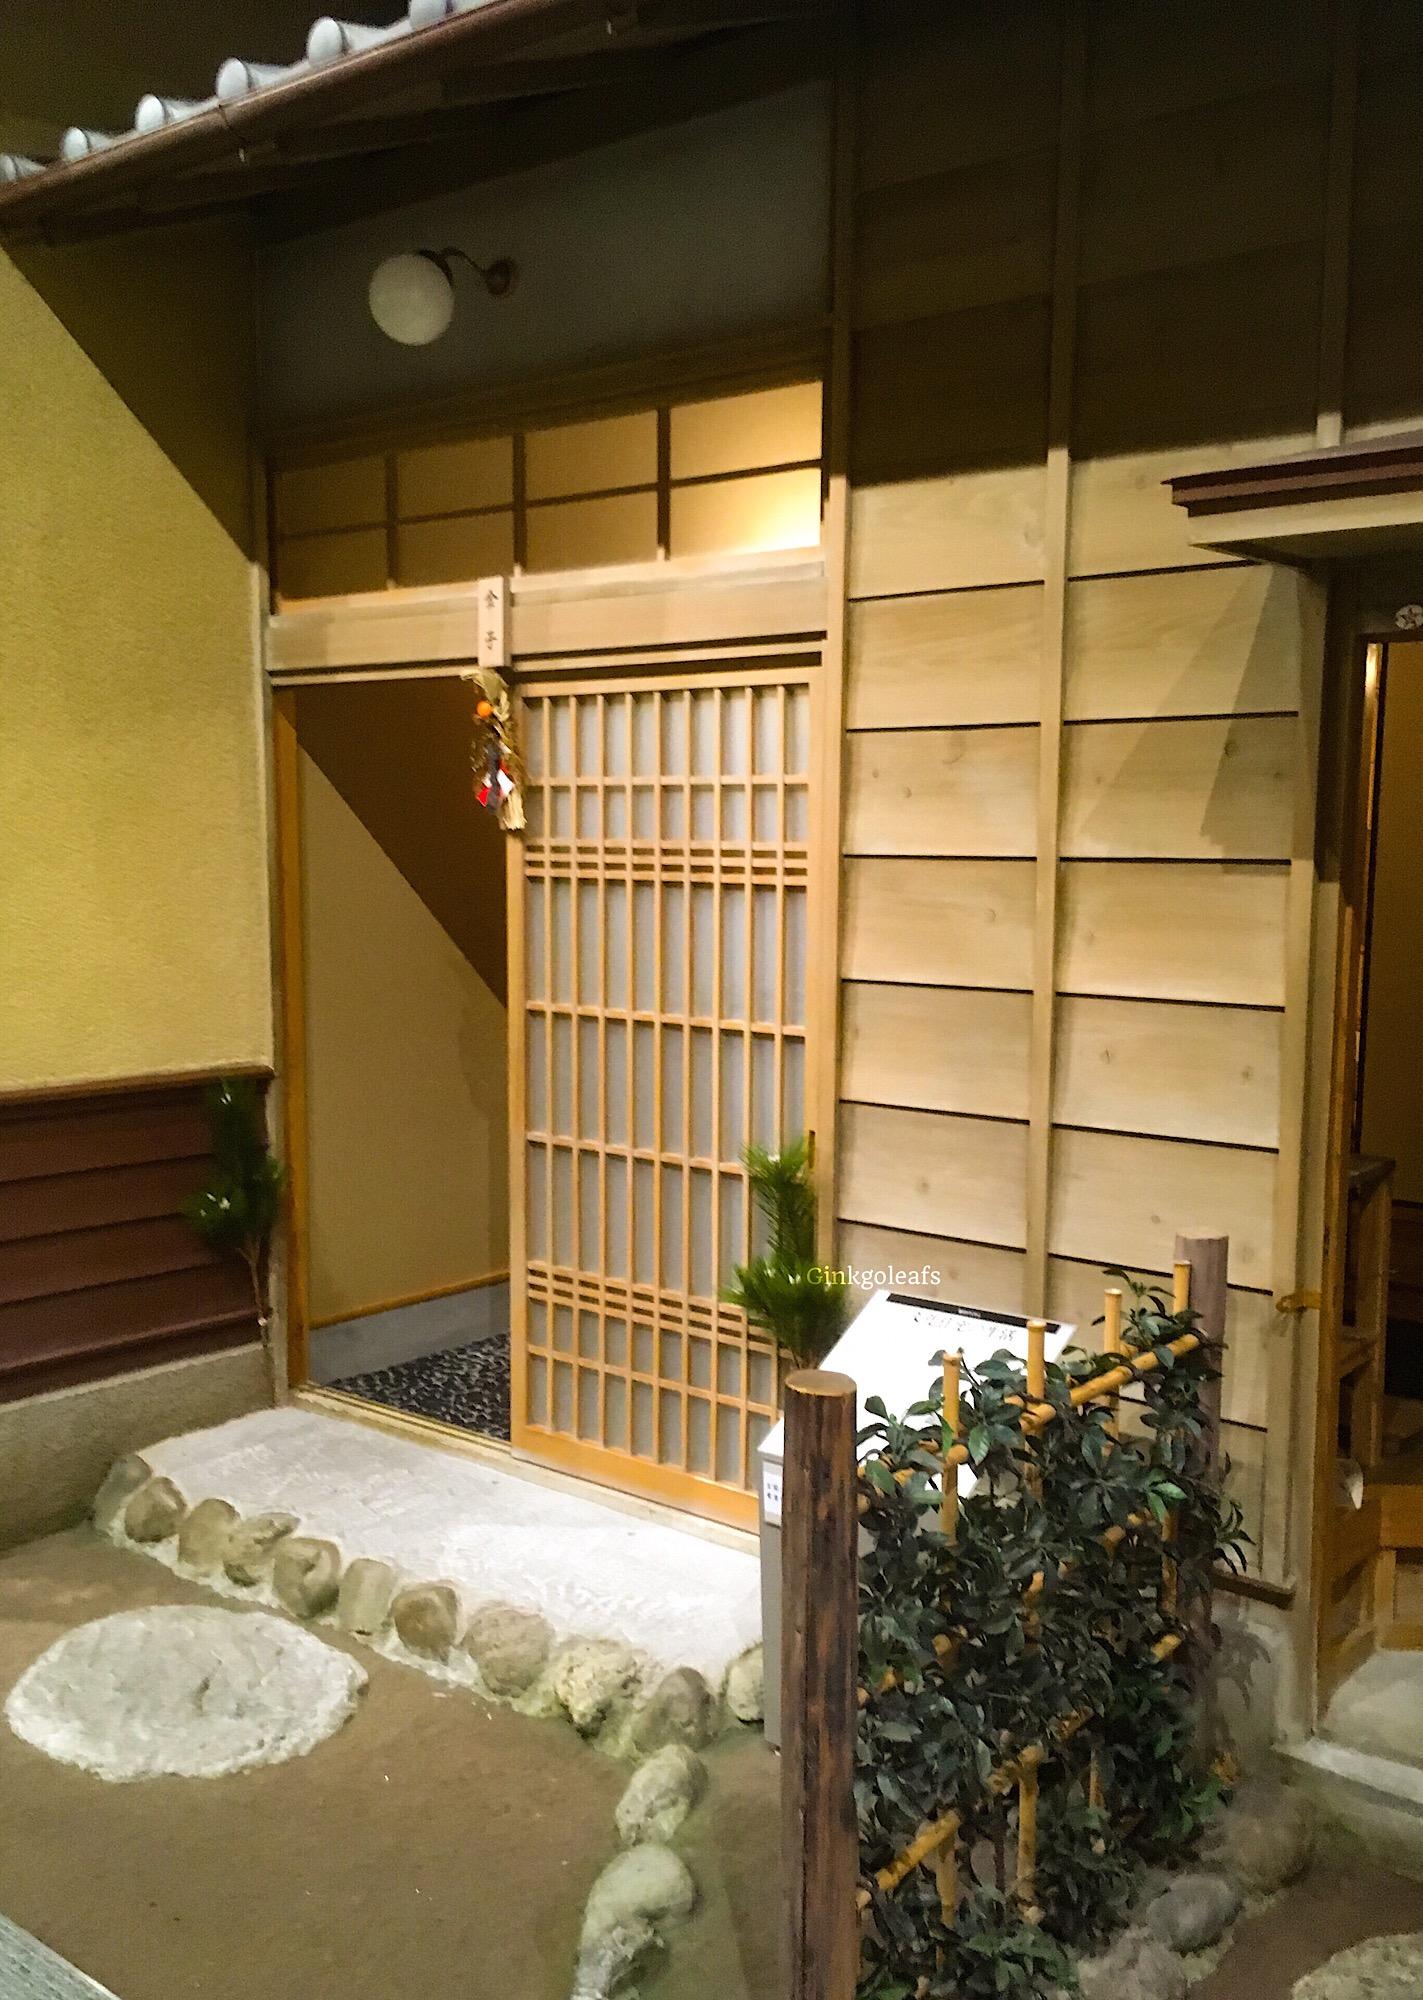 Shinjuku Geschichts Museum